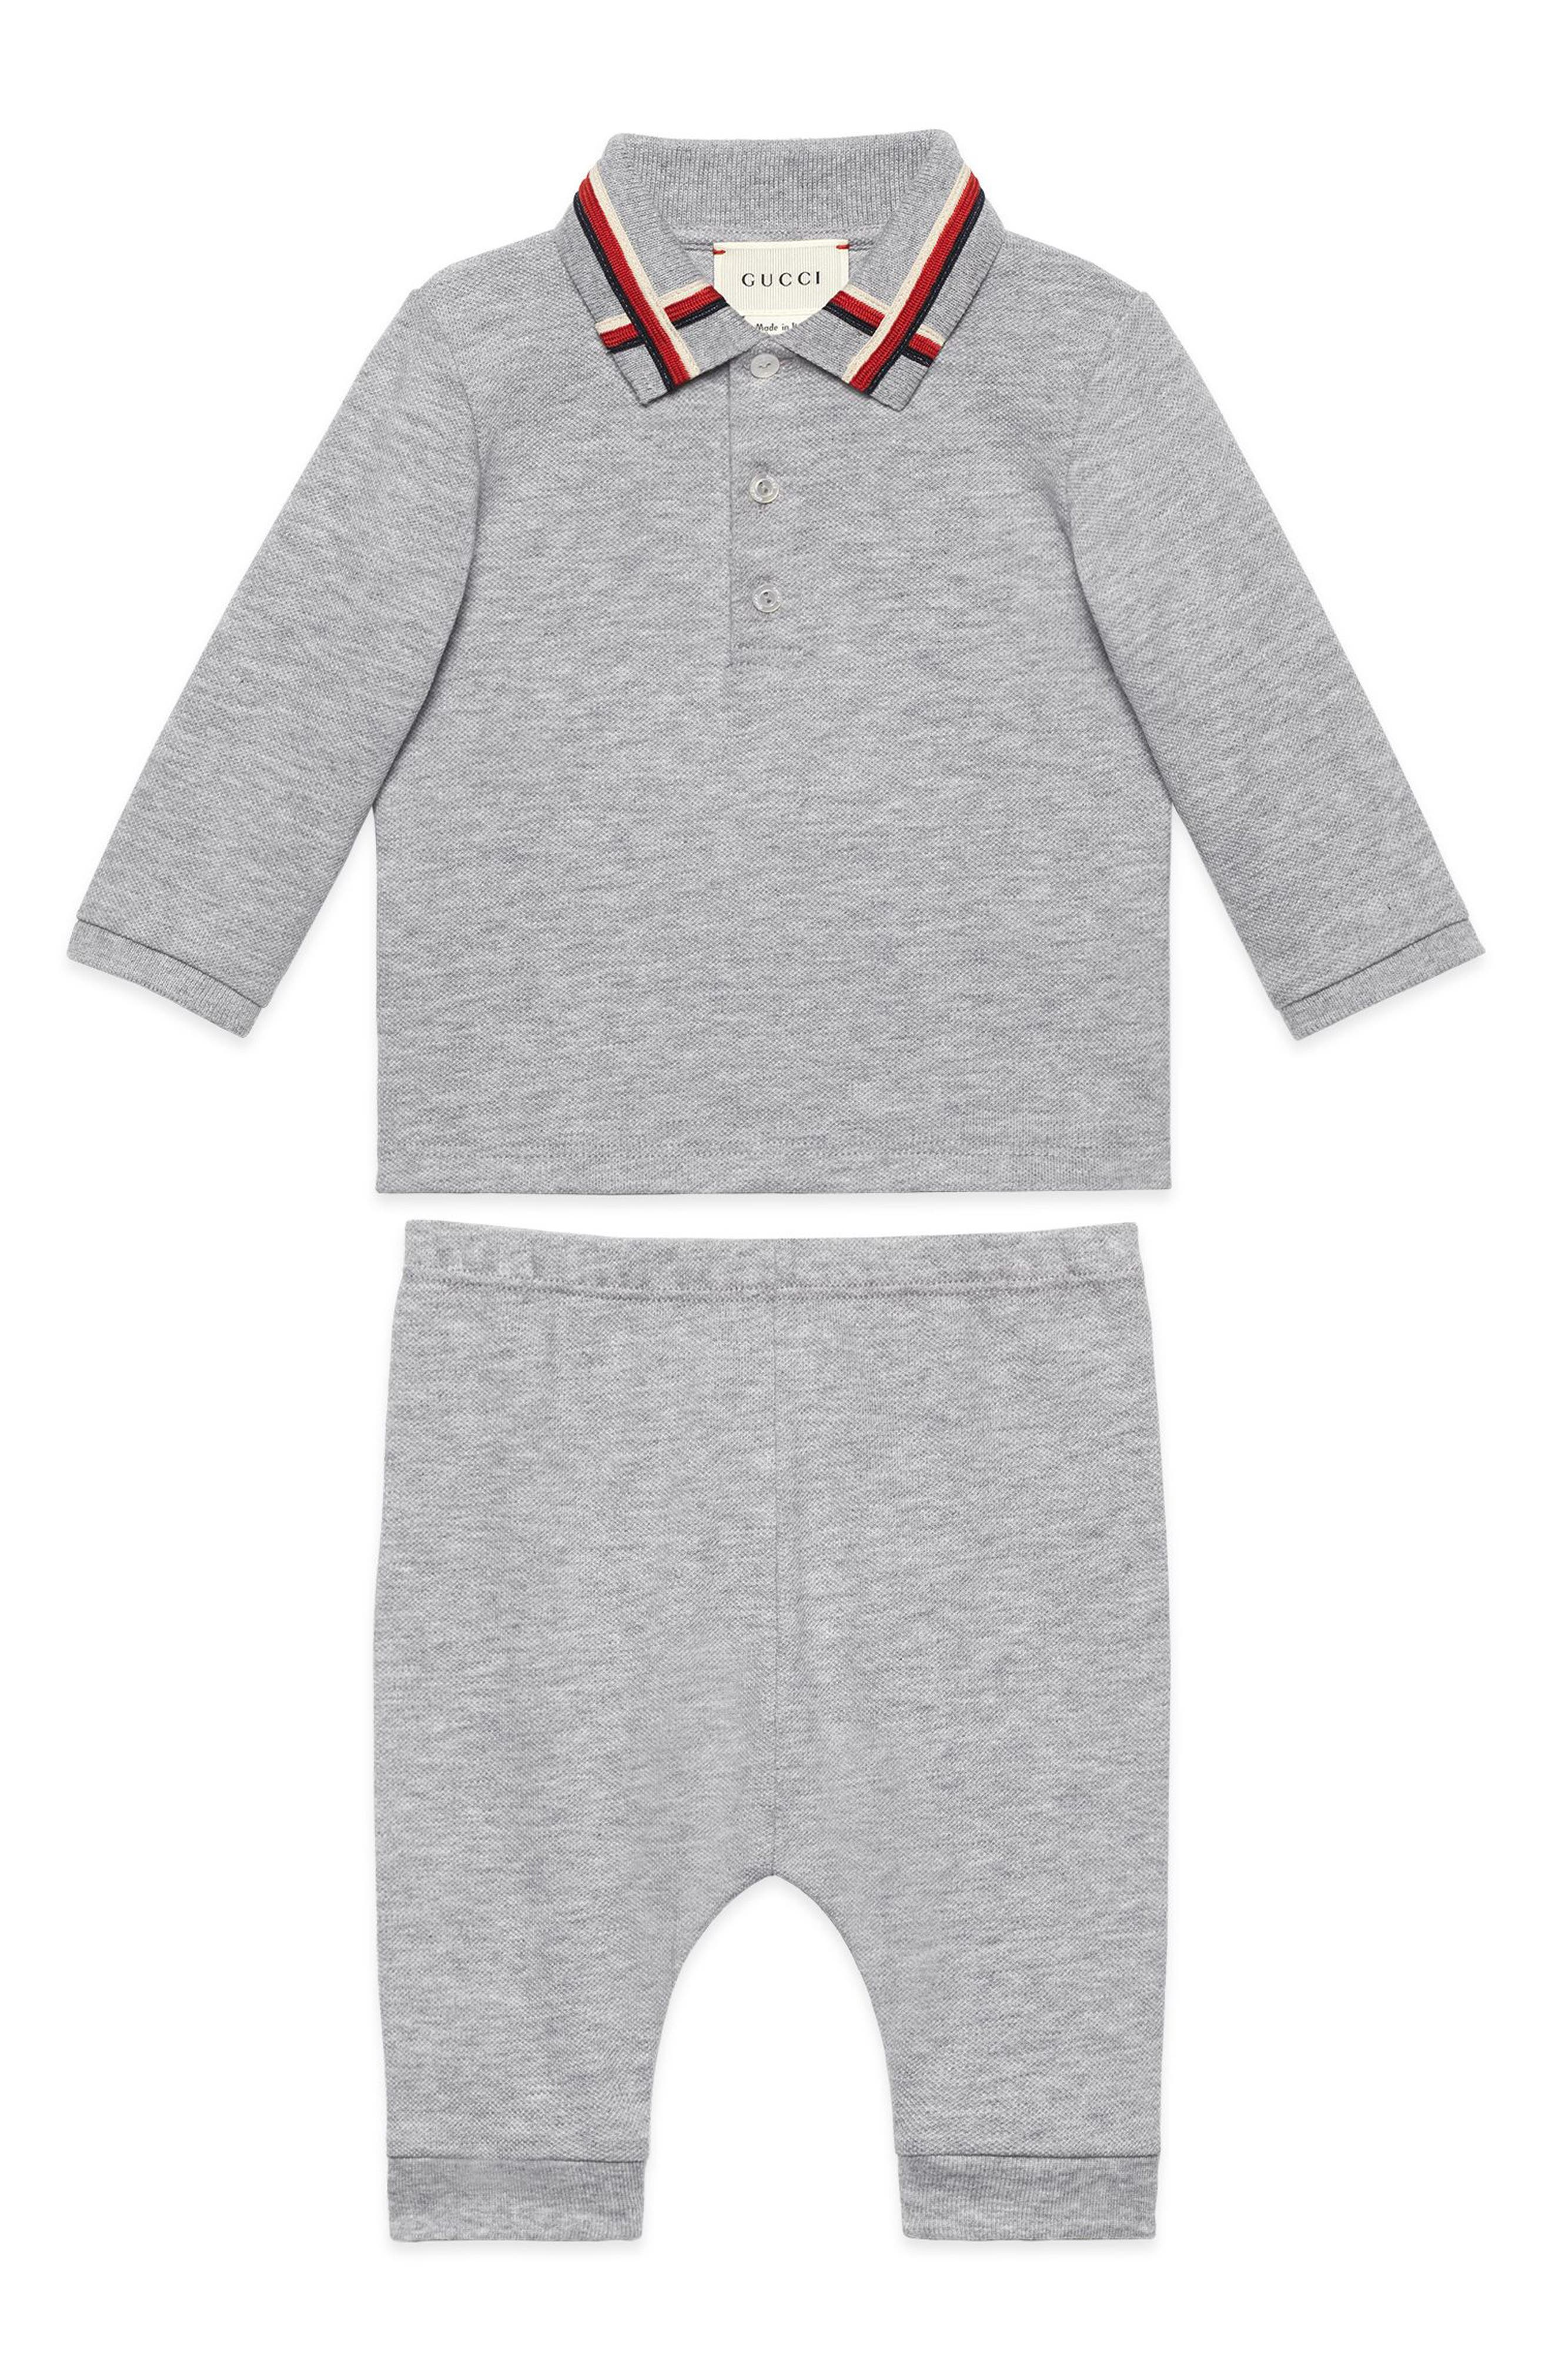 GUCCI Polo & Pants Set